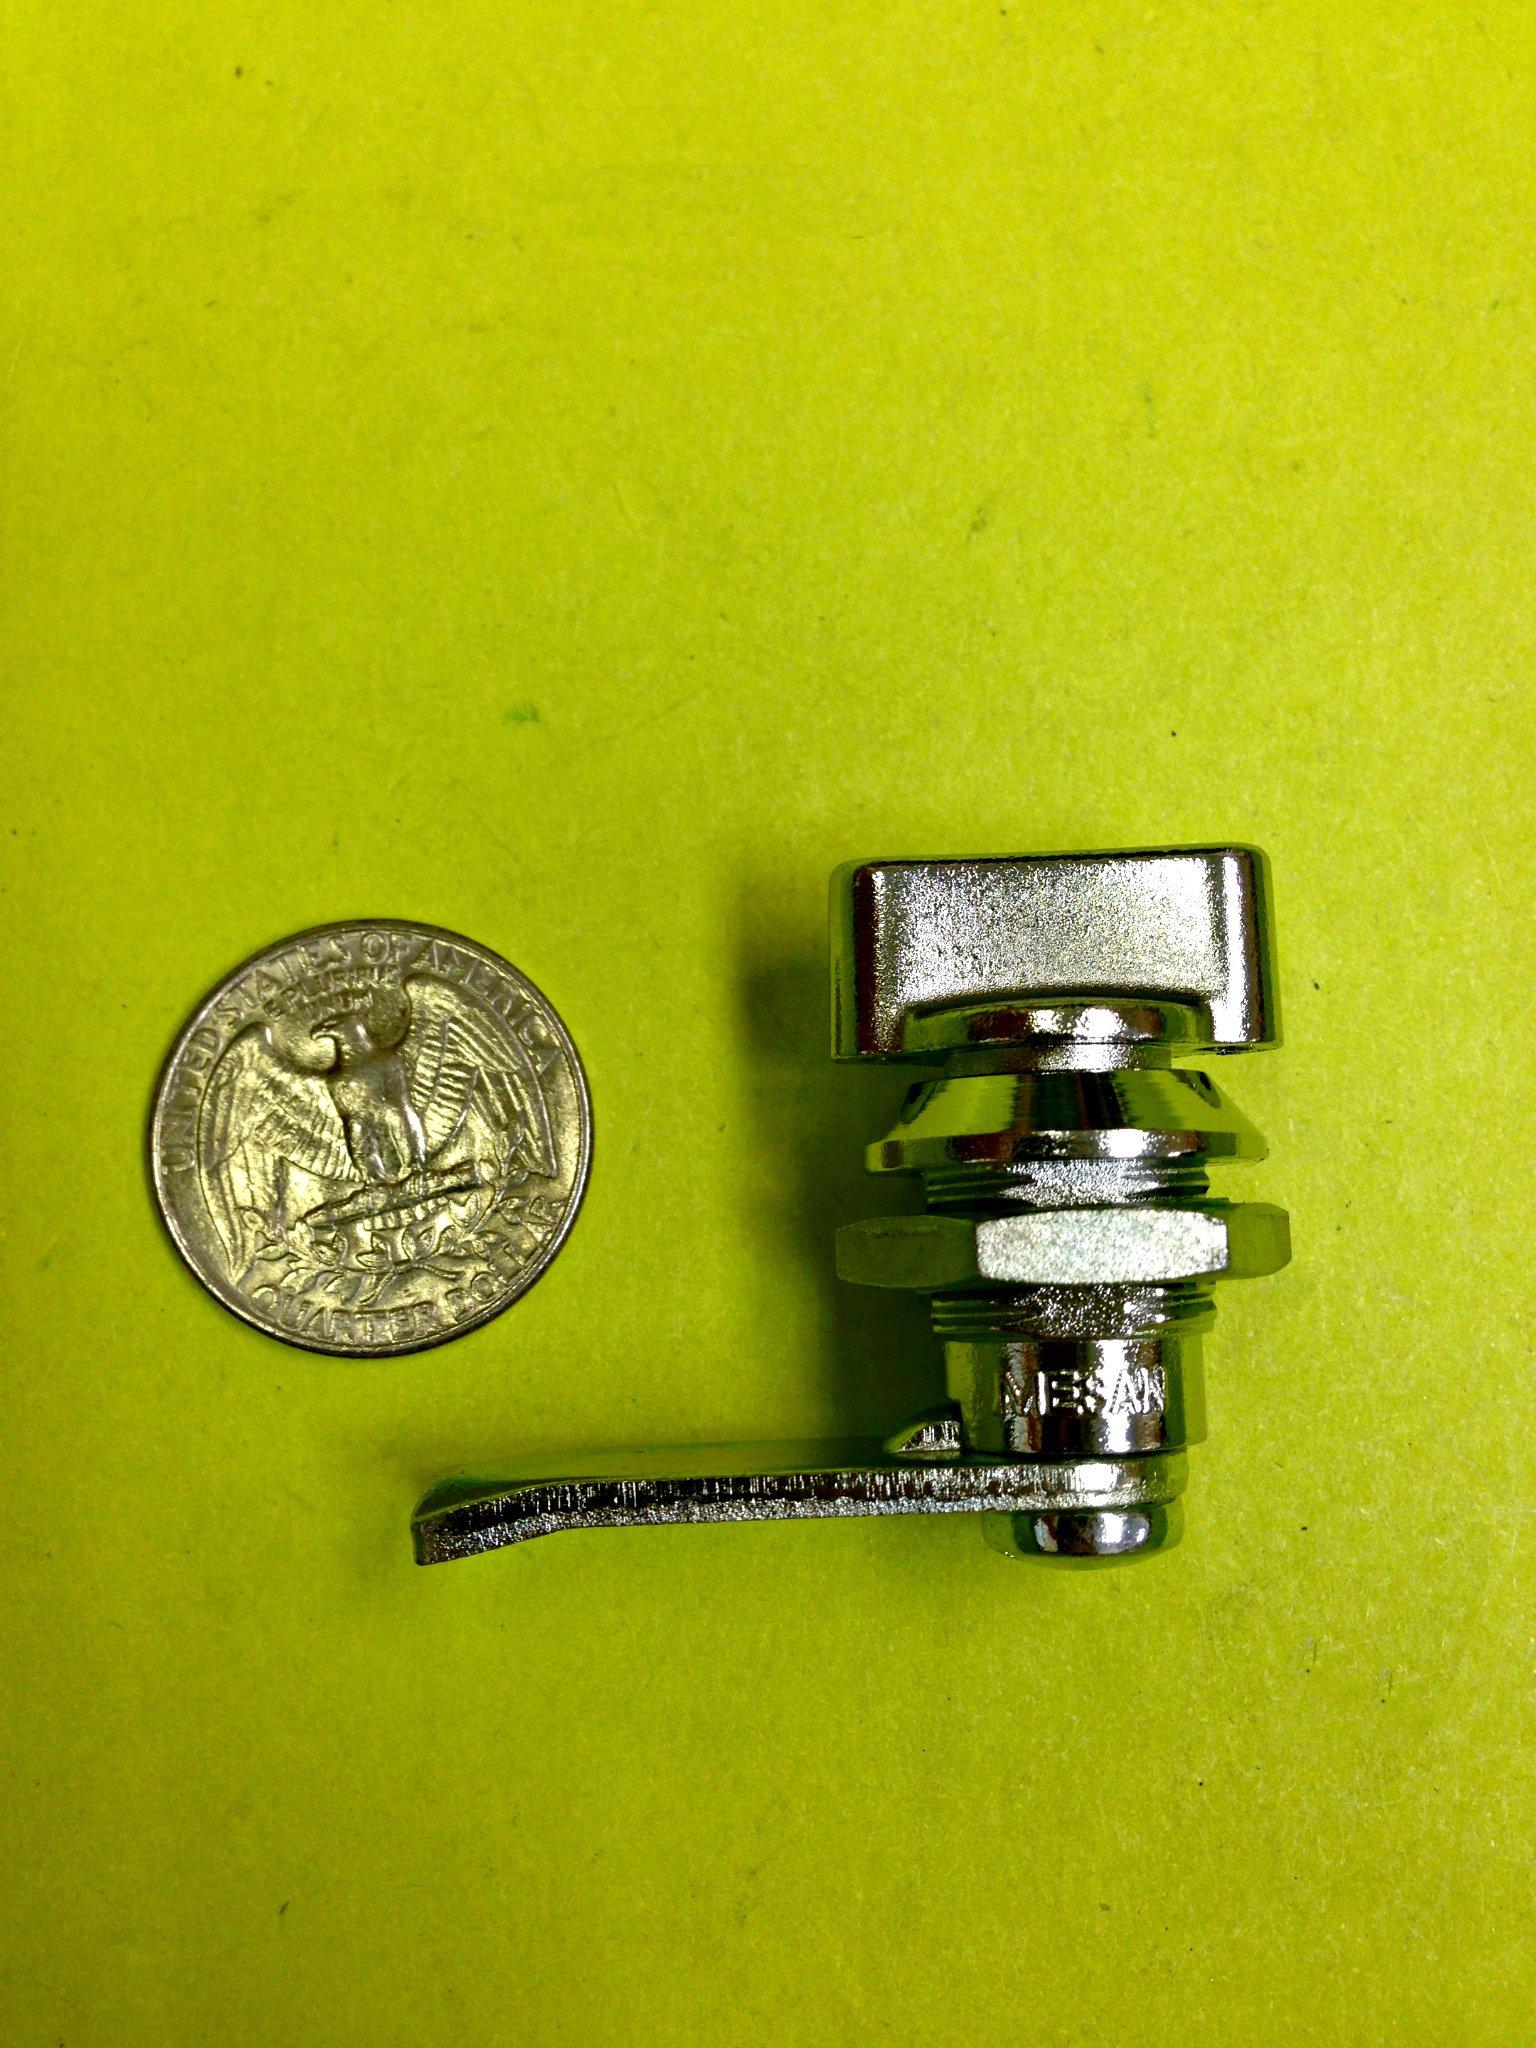 LOT OF 4 MINI CAM LOCK WING KNOB CABINET BOX DRAWER MAILBOX CUPBOARD DESK #166.1.1.10